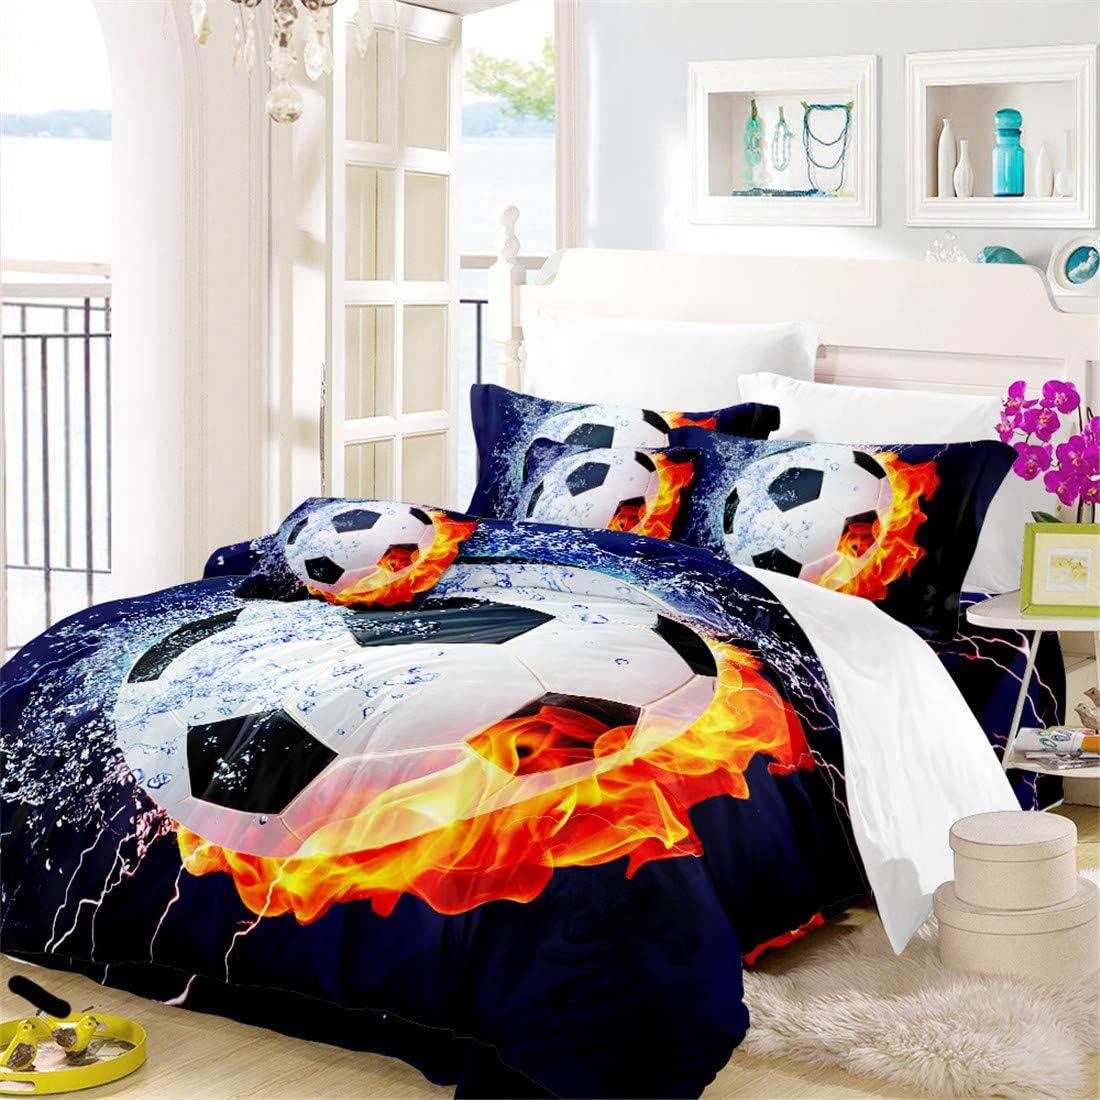 Oliven 3D Boys Bedding Sets Full Size Soccer Ball/Football 100% Breathable Polyester Kids Duvet Cover Set 3 Pcs,No Comforter and Sheet